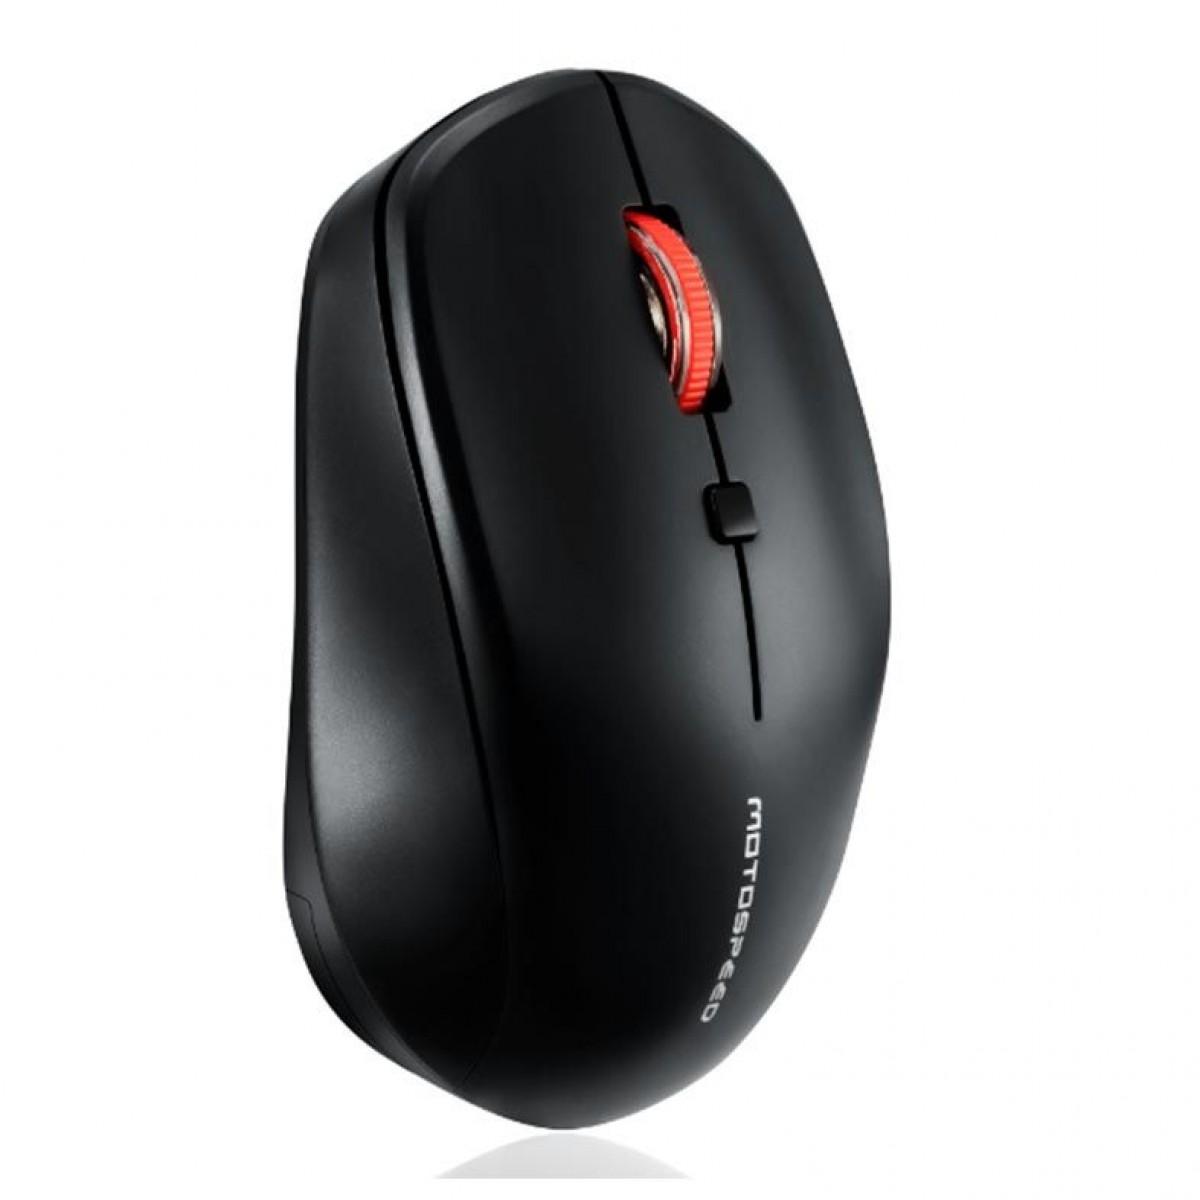 Mouse Wireless Motospeed G40, 1600 DPI, Black, FMSMS0066PTO